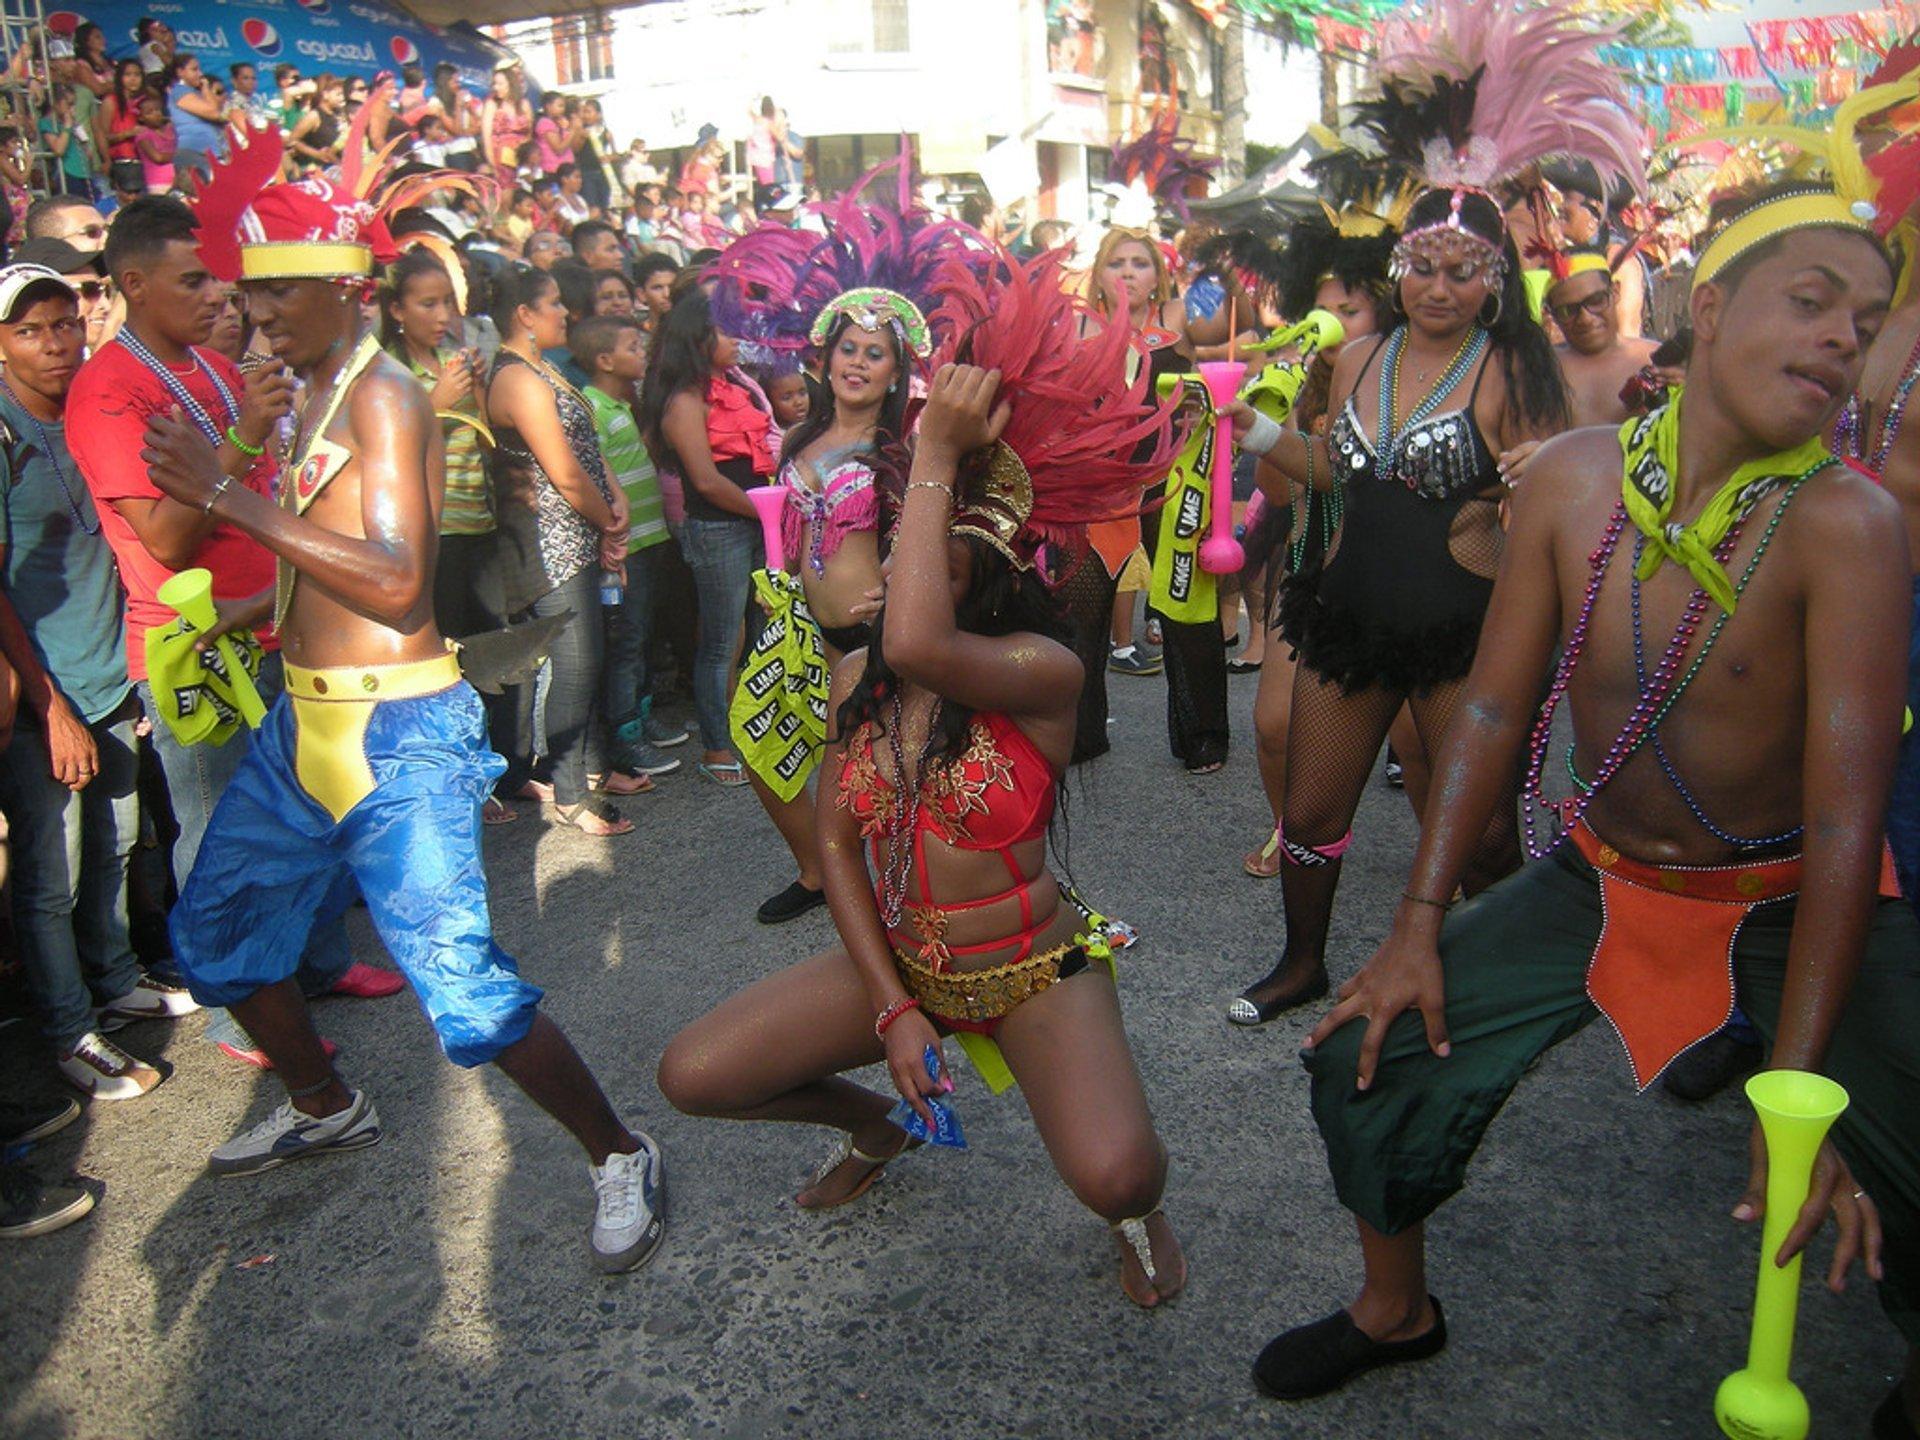 La Ceiba Carnival (Carnaval de la Ceiba) in Honduras - Best Season 2020